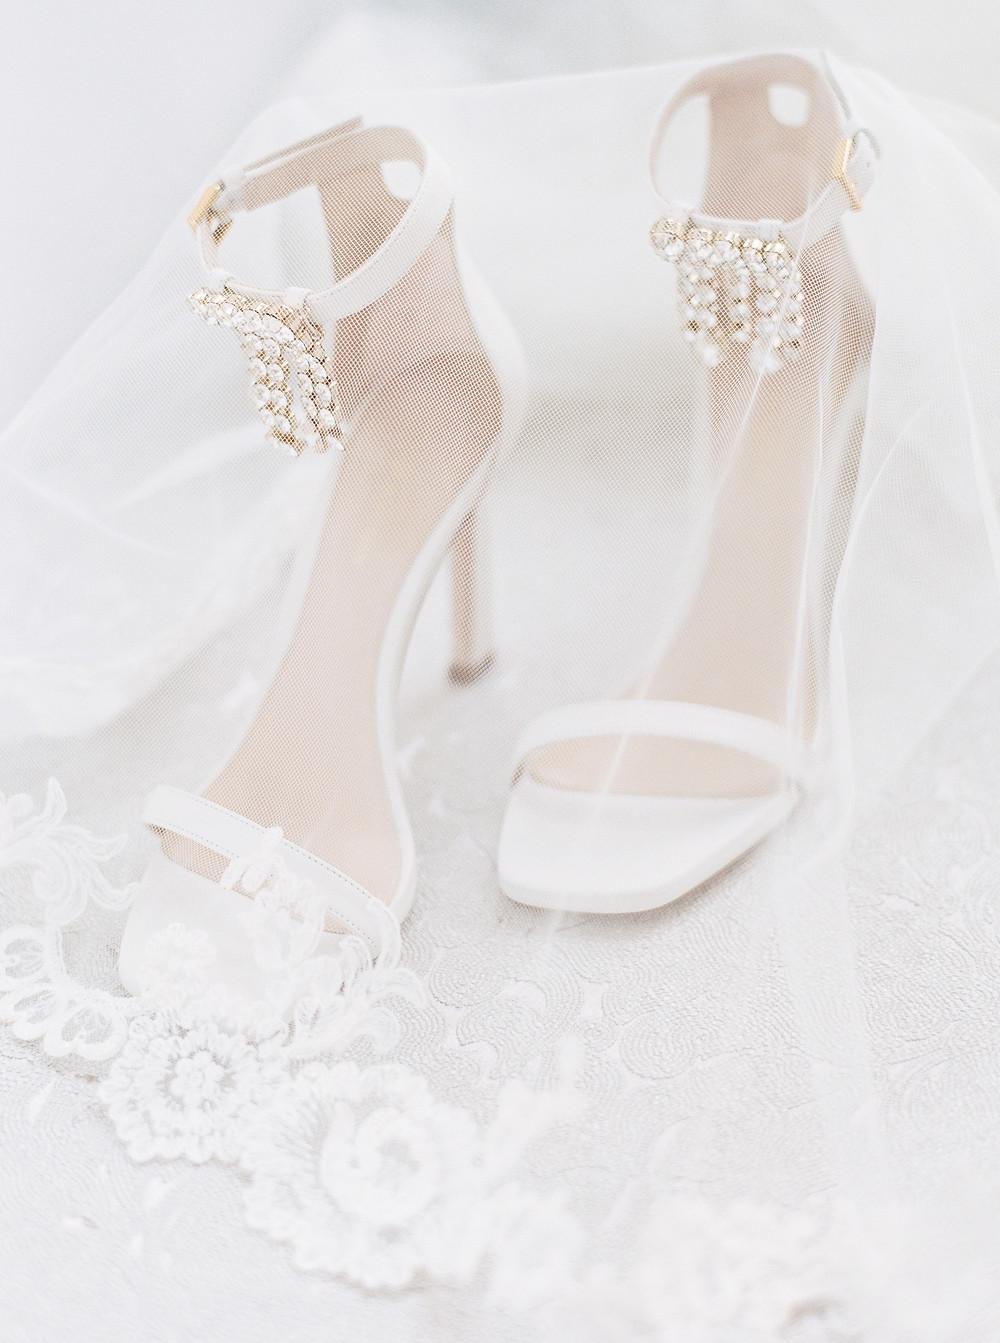 Arizona Biltmore Classic White Wedding, Shoes